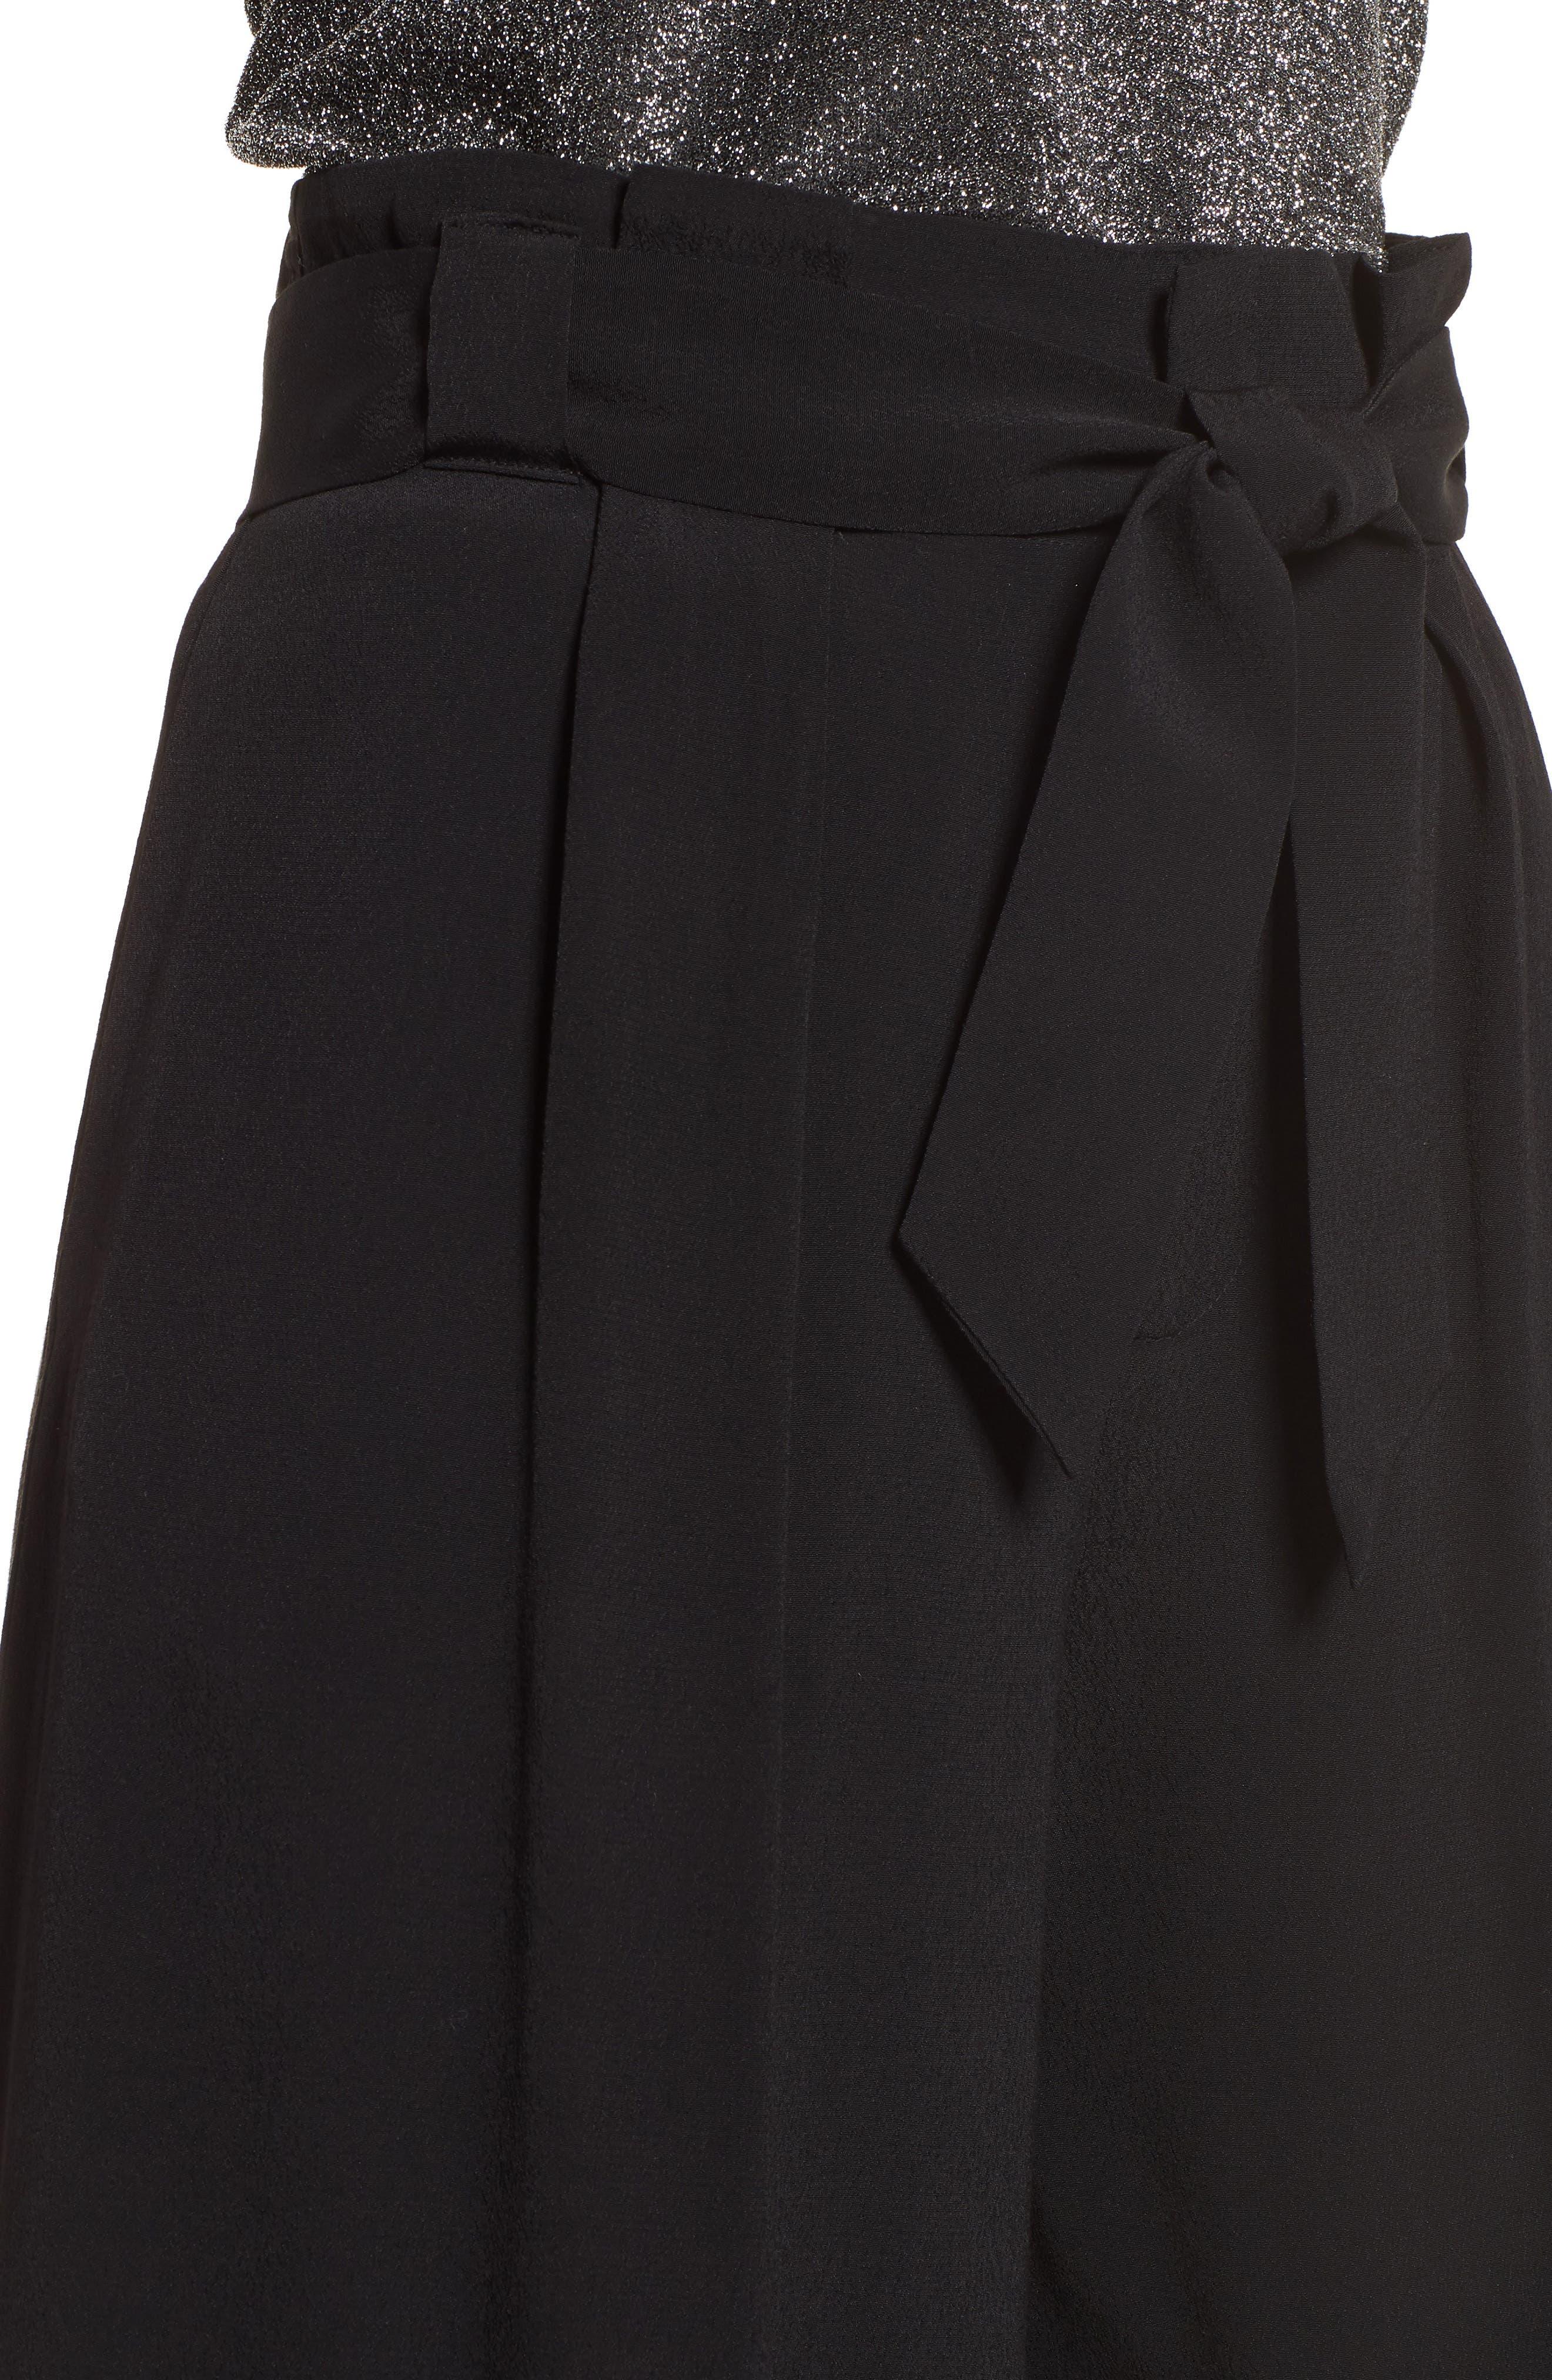 Paperbag Waist Culottes,                             Alternate thumbnail 4, color,                             Black